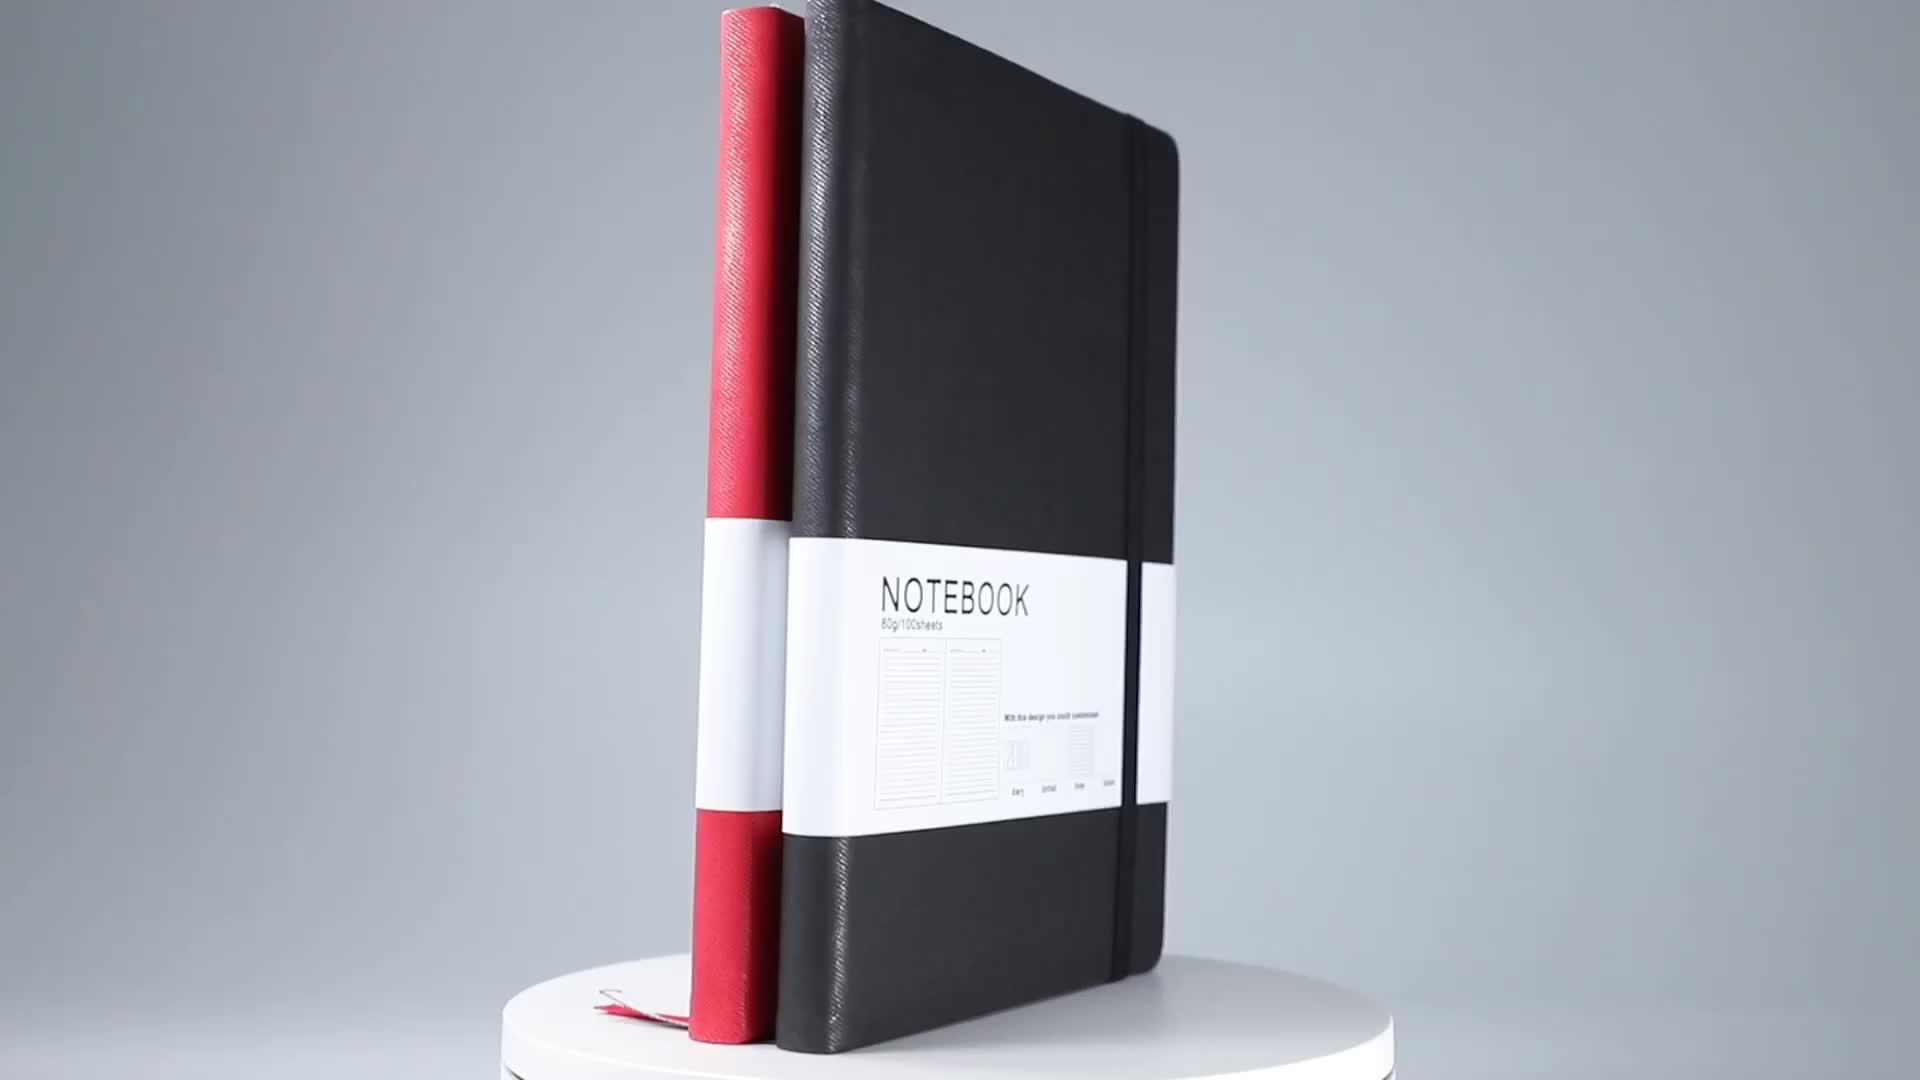 Custom journal 책 printing 와 ribbon 재활용 a5 pu leather 노트북 와 펜 노트북 및 펜